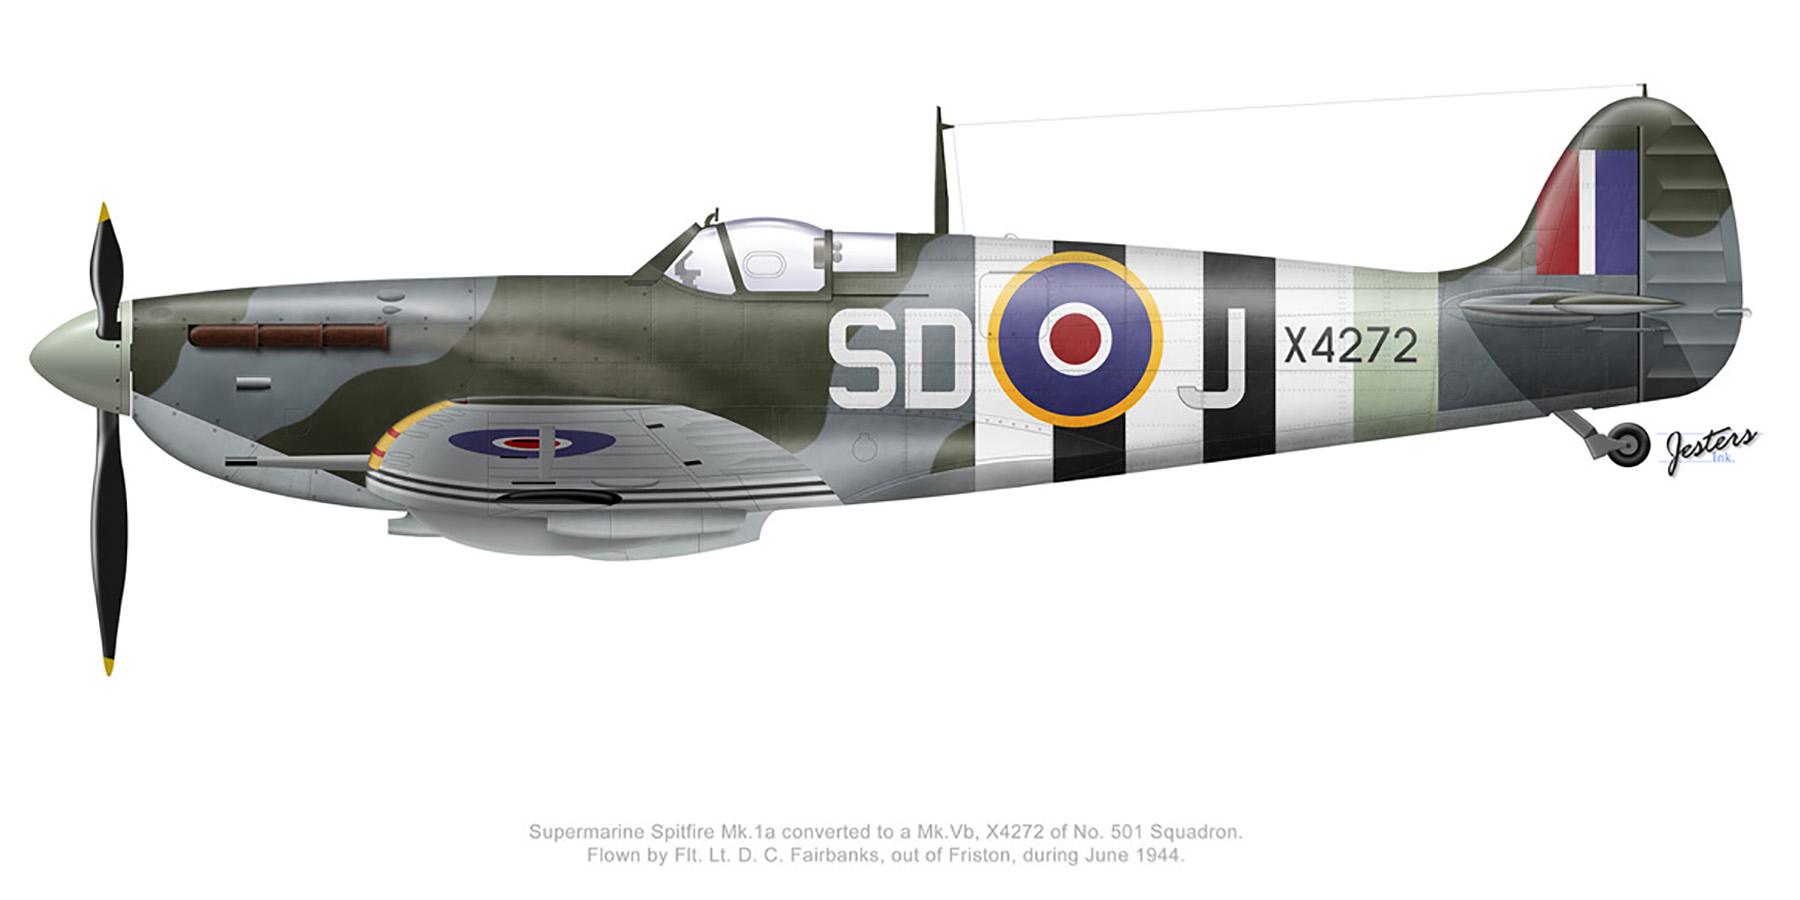 Spitfire MkVb RAF 501Sqn SDJ DC Fairbanks X4272 Friston June 1944 0A